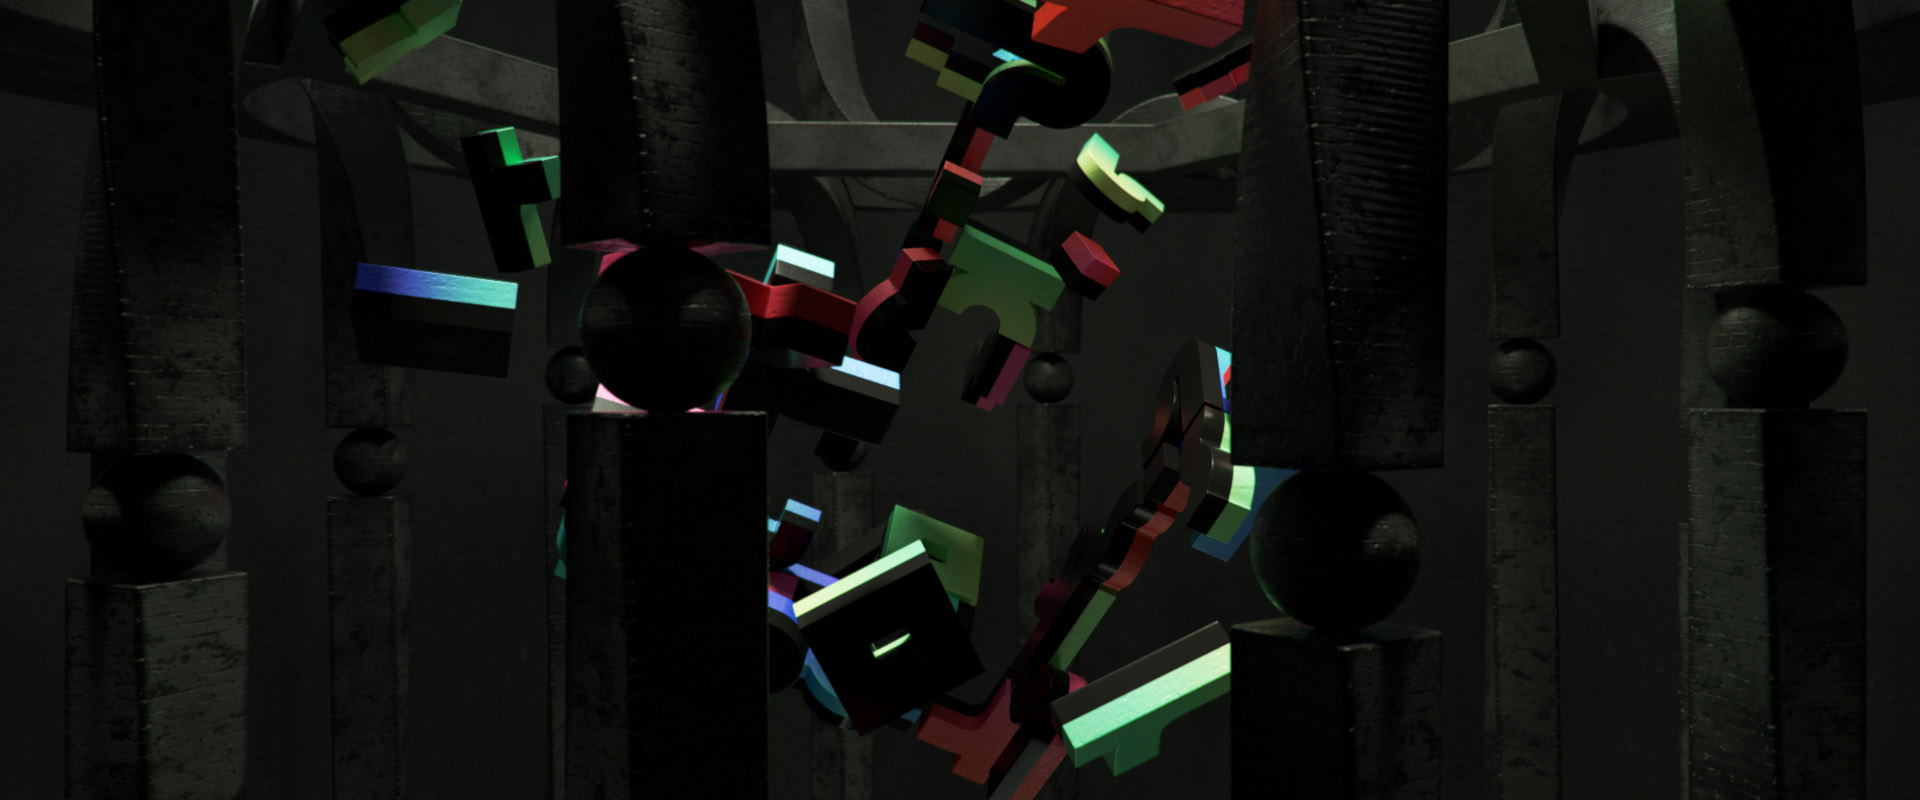 BRIEF_FESTIVAL_09 copy.jpg